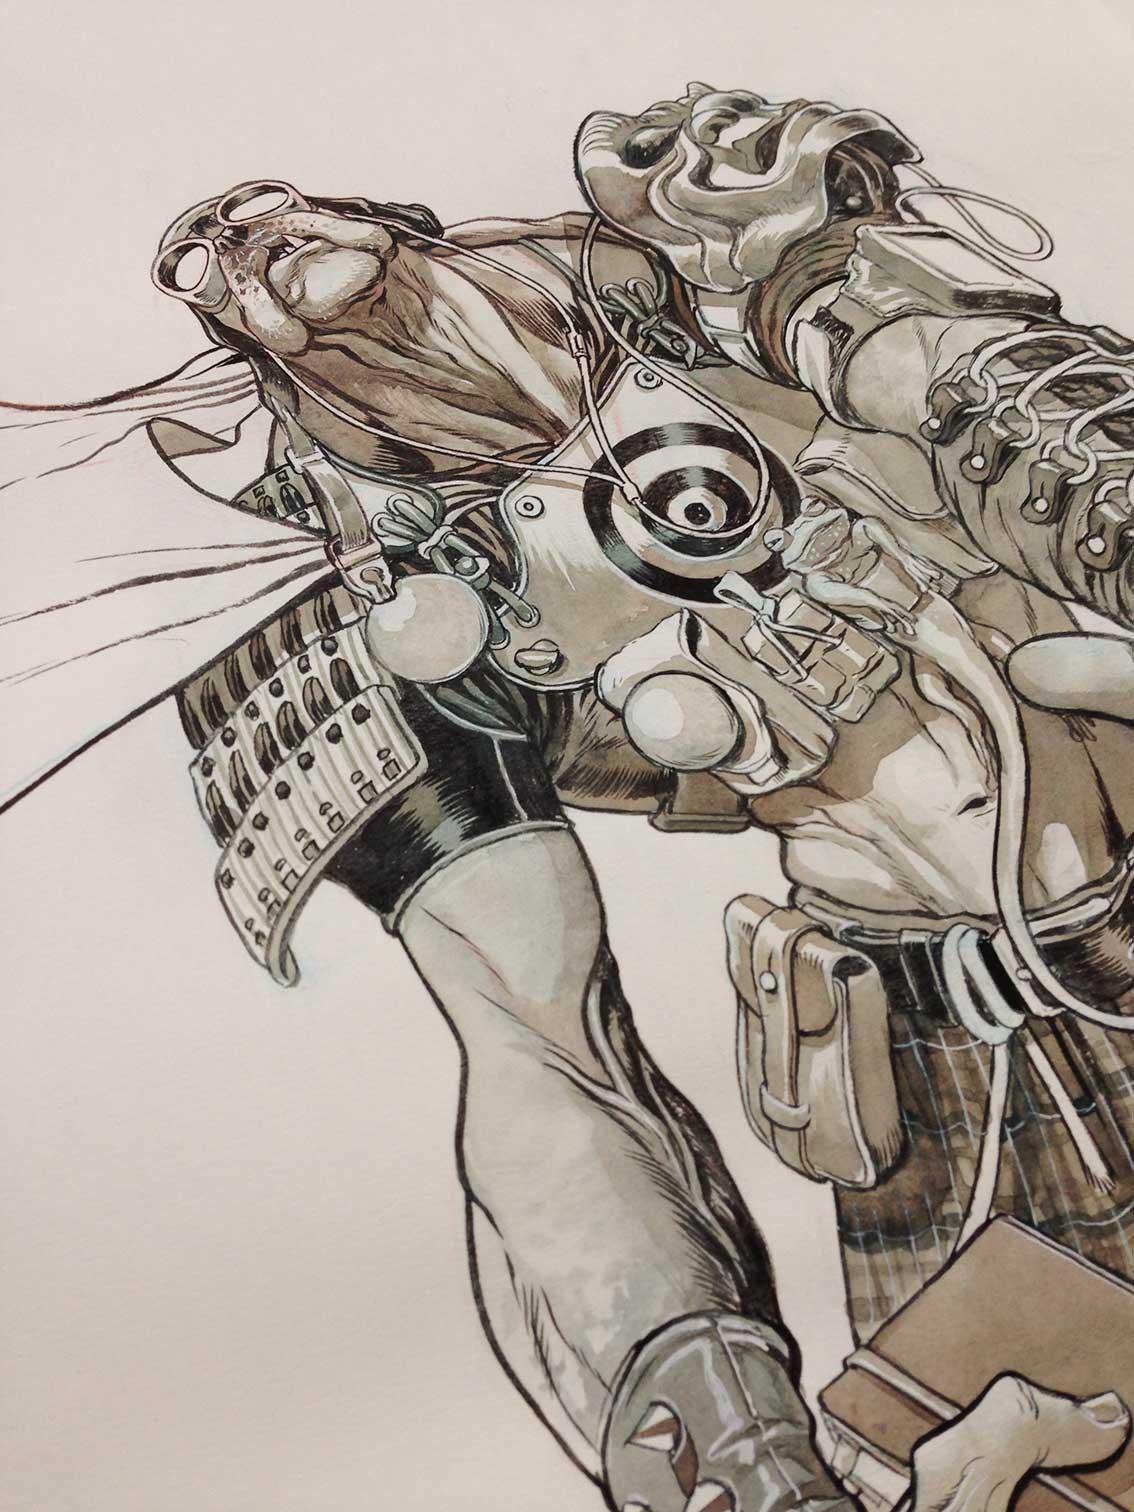 diburros-sketchbook-vol2-capa-01